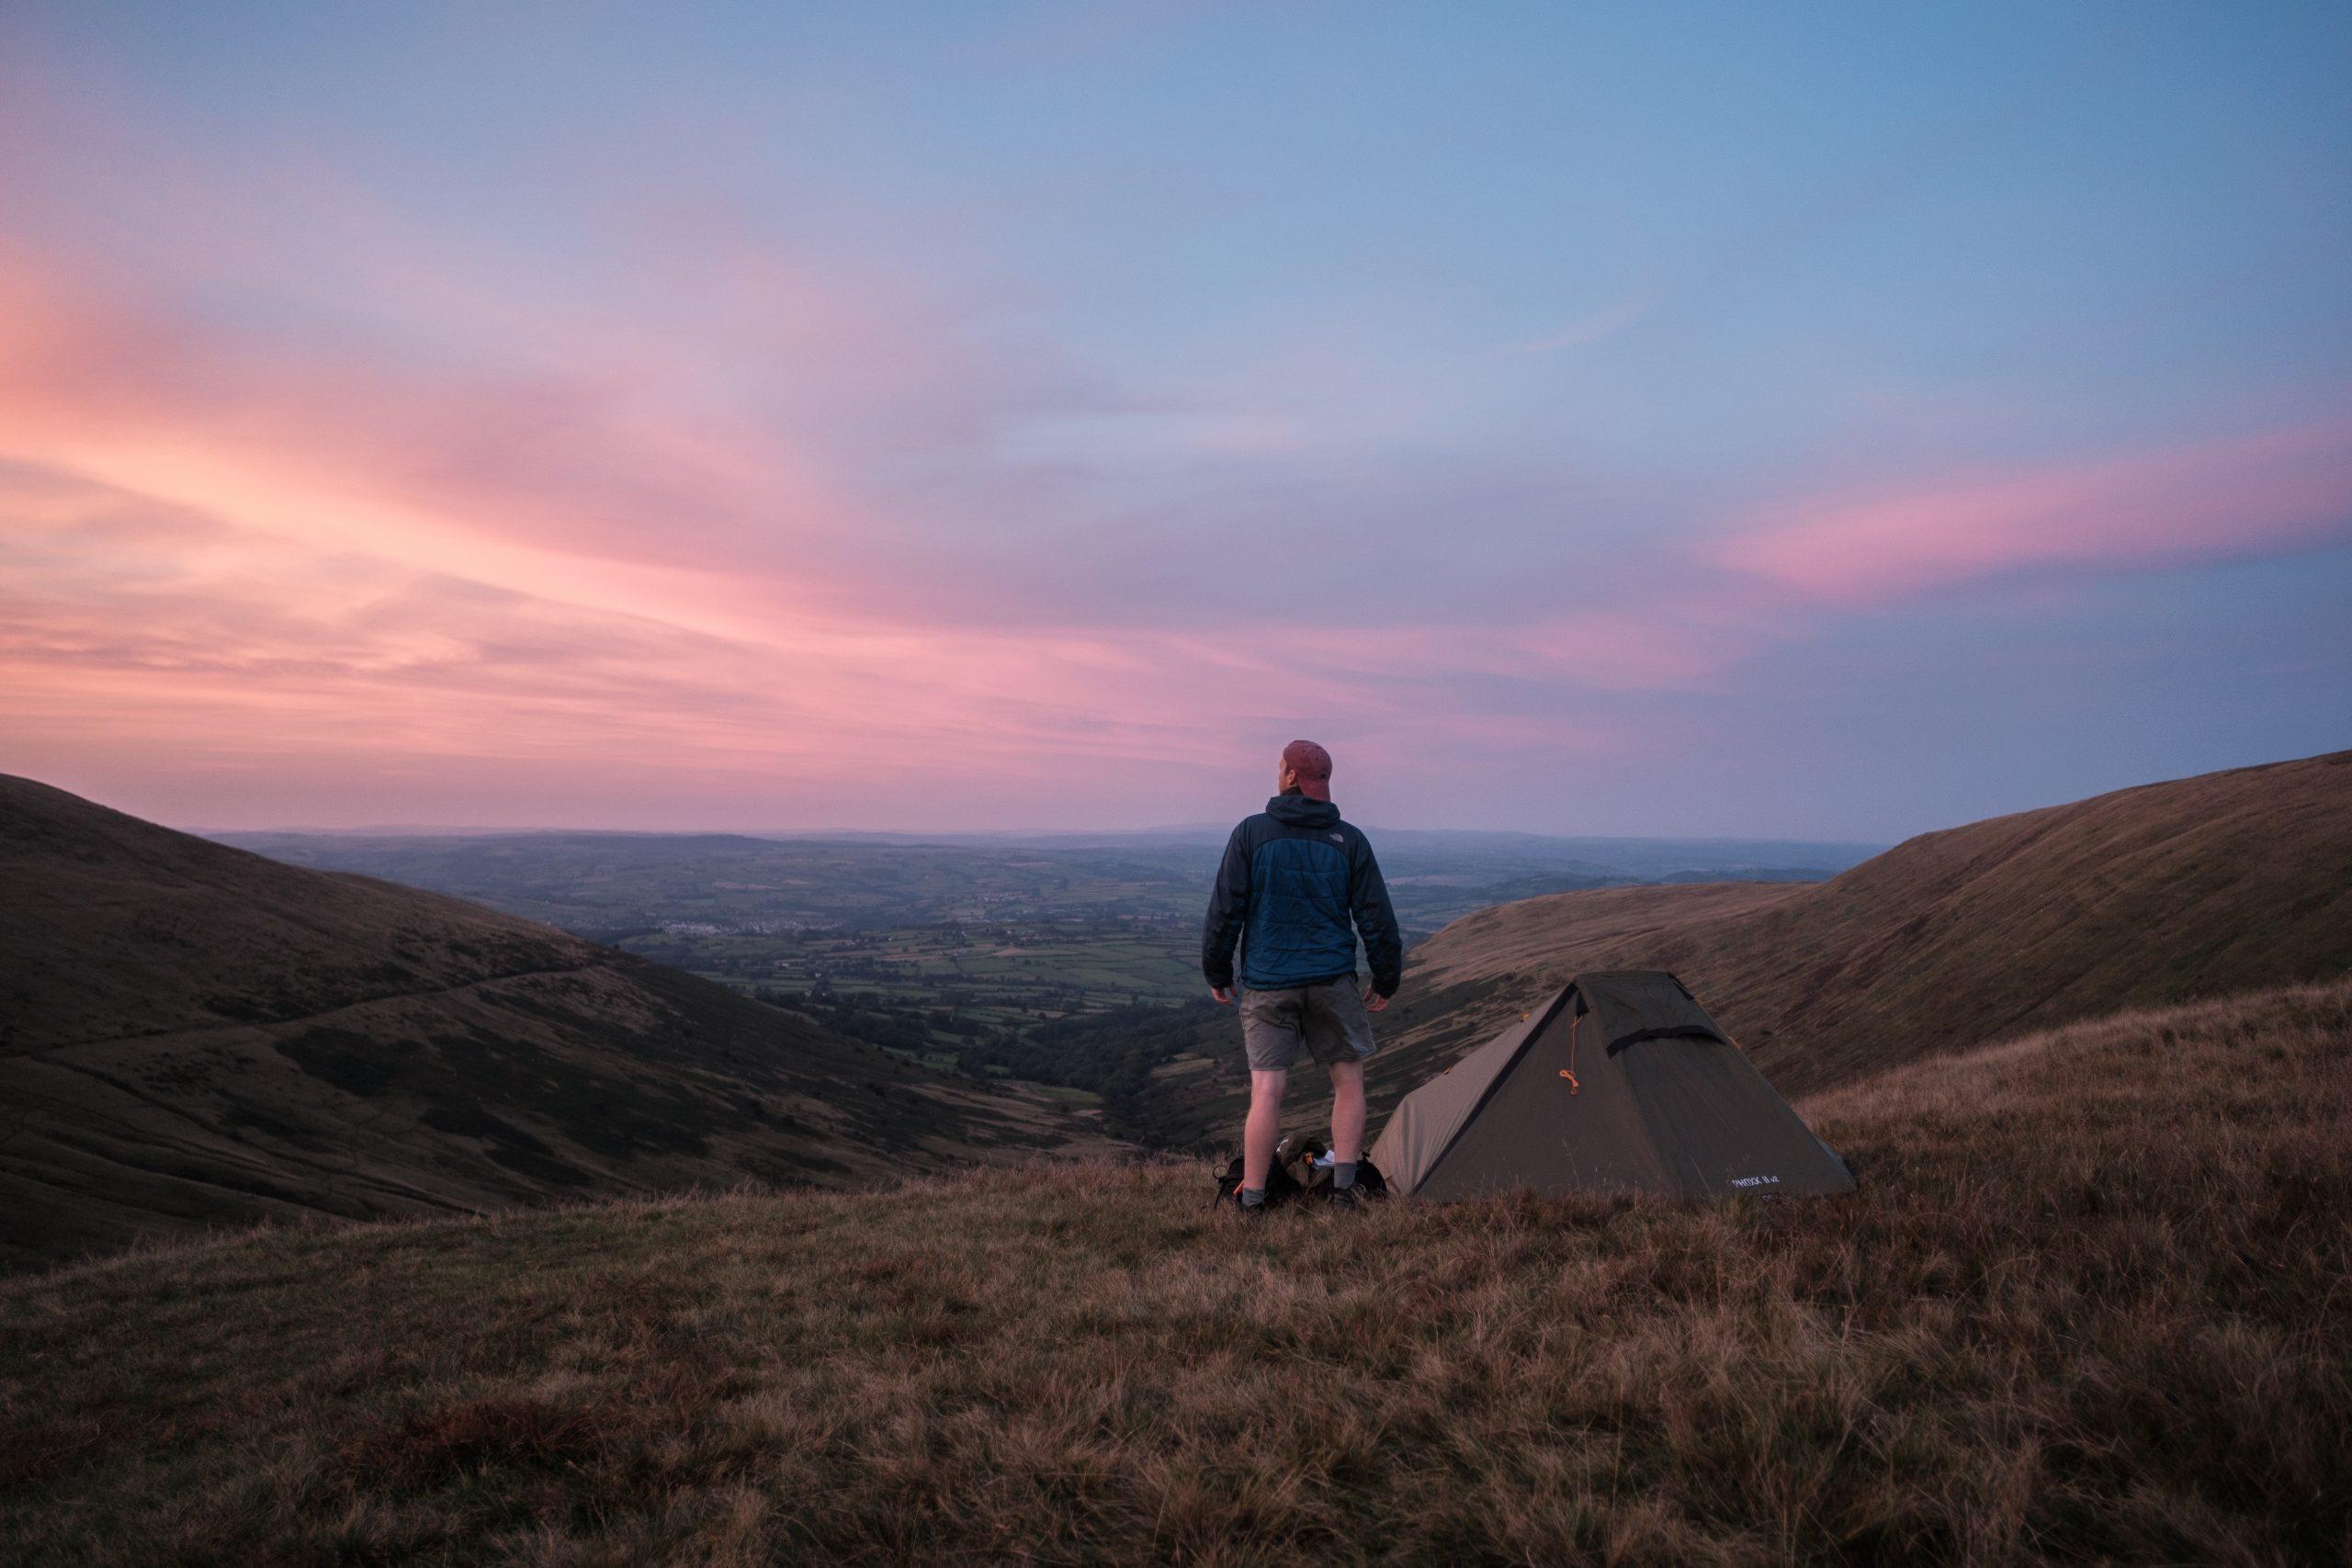 Wild Camping Pen Y Fan Brecon Beacons Wales - Ben Holbrook DriftwoodJournals.com